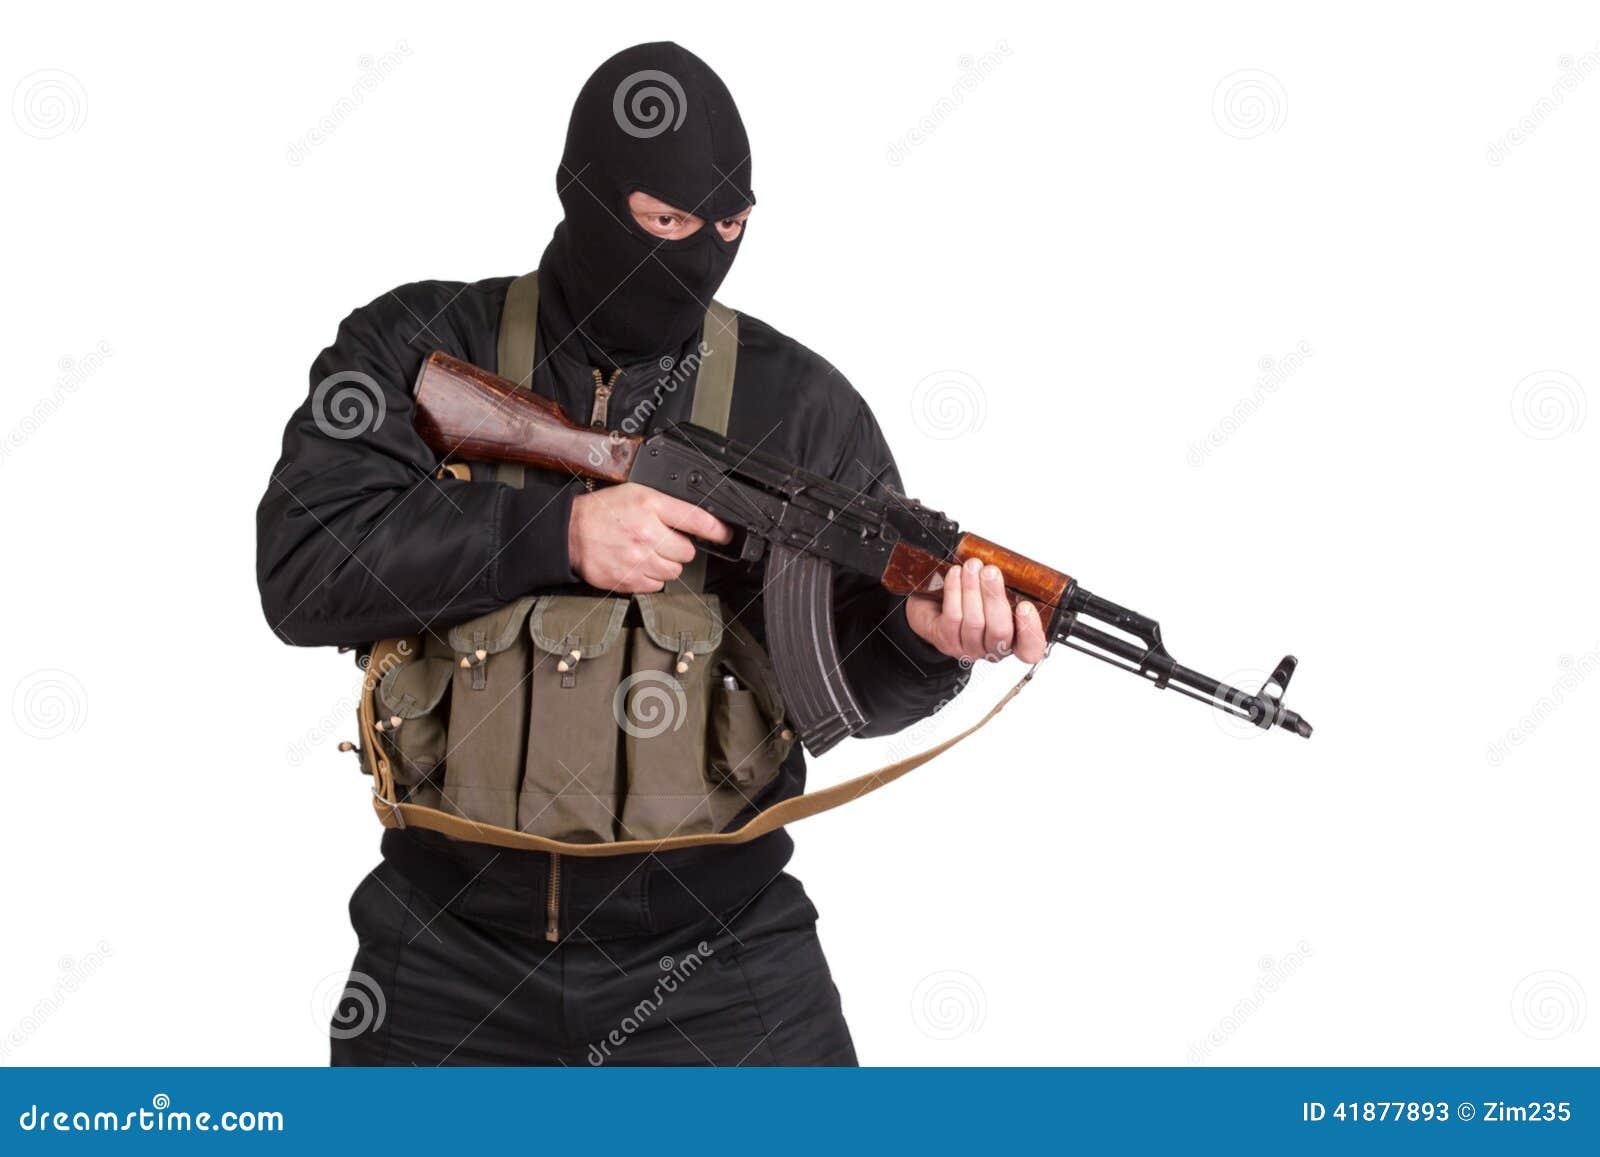 Terrorist Photo: Terrorist In Black Uniform And Mask With Kalashnikov